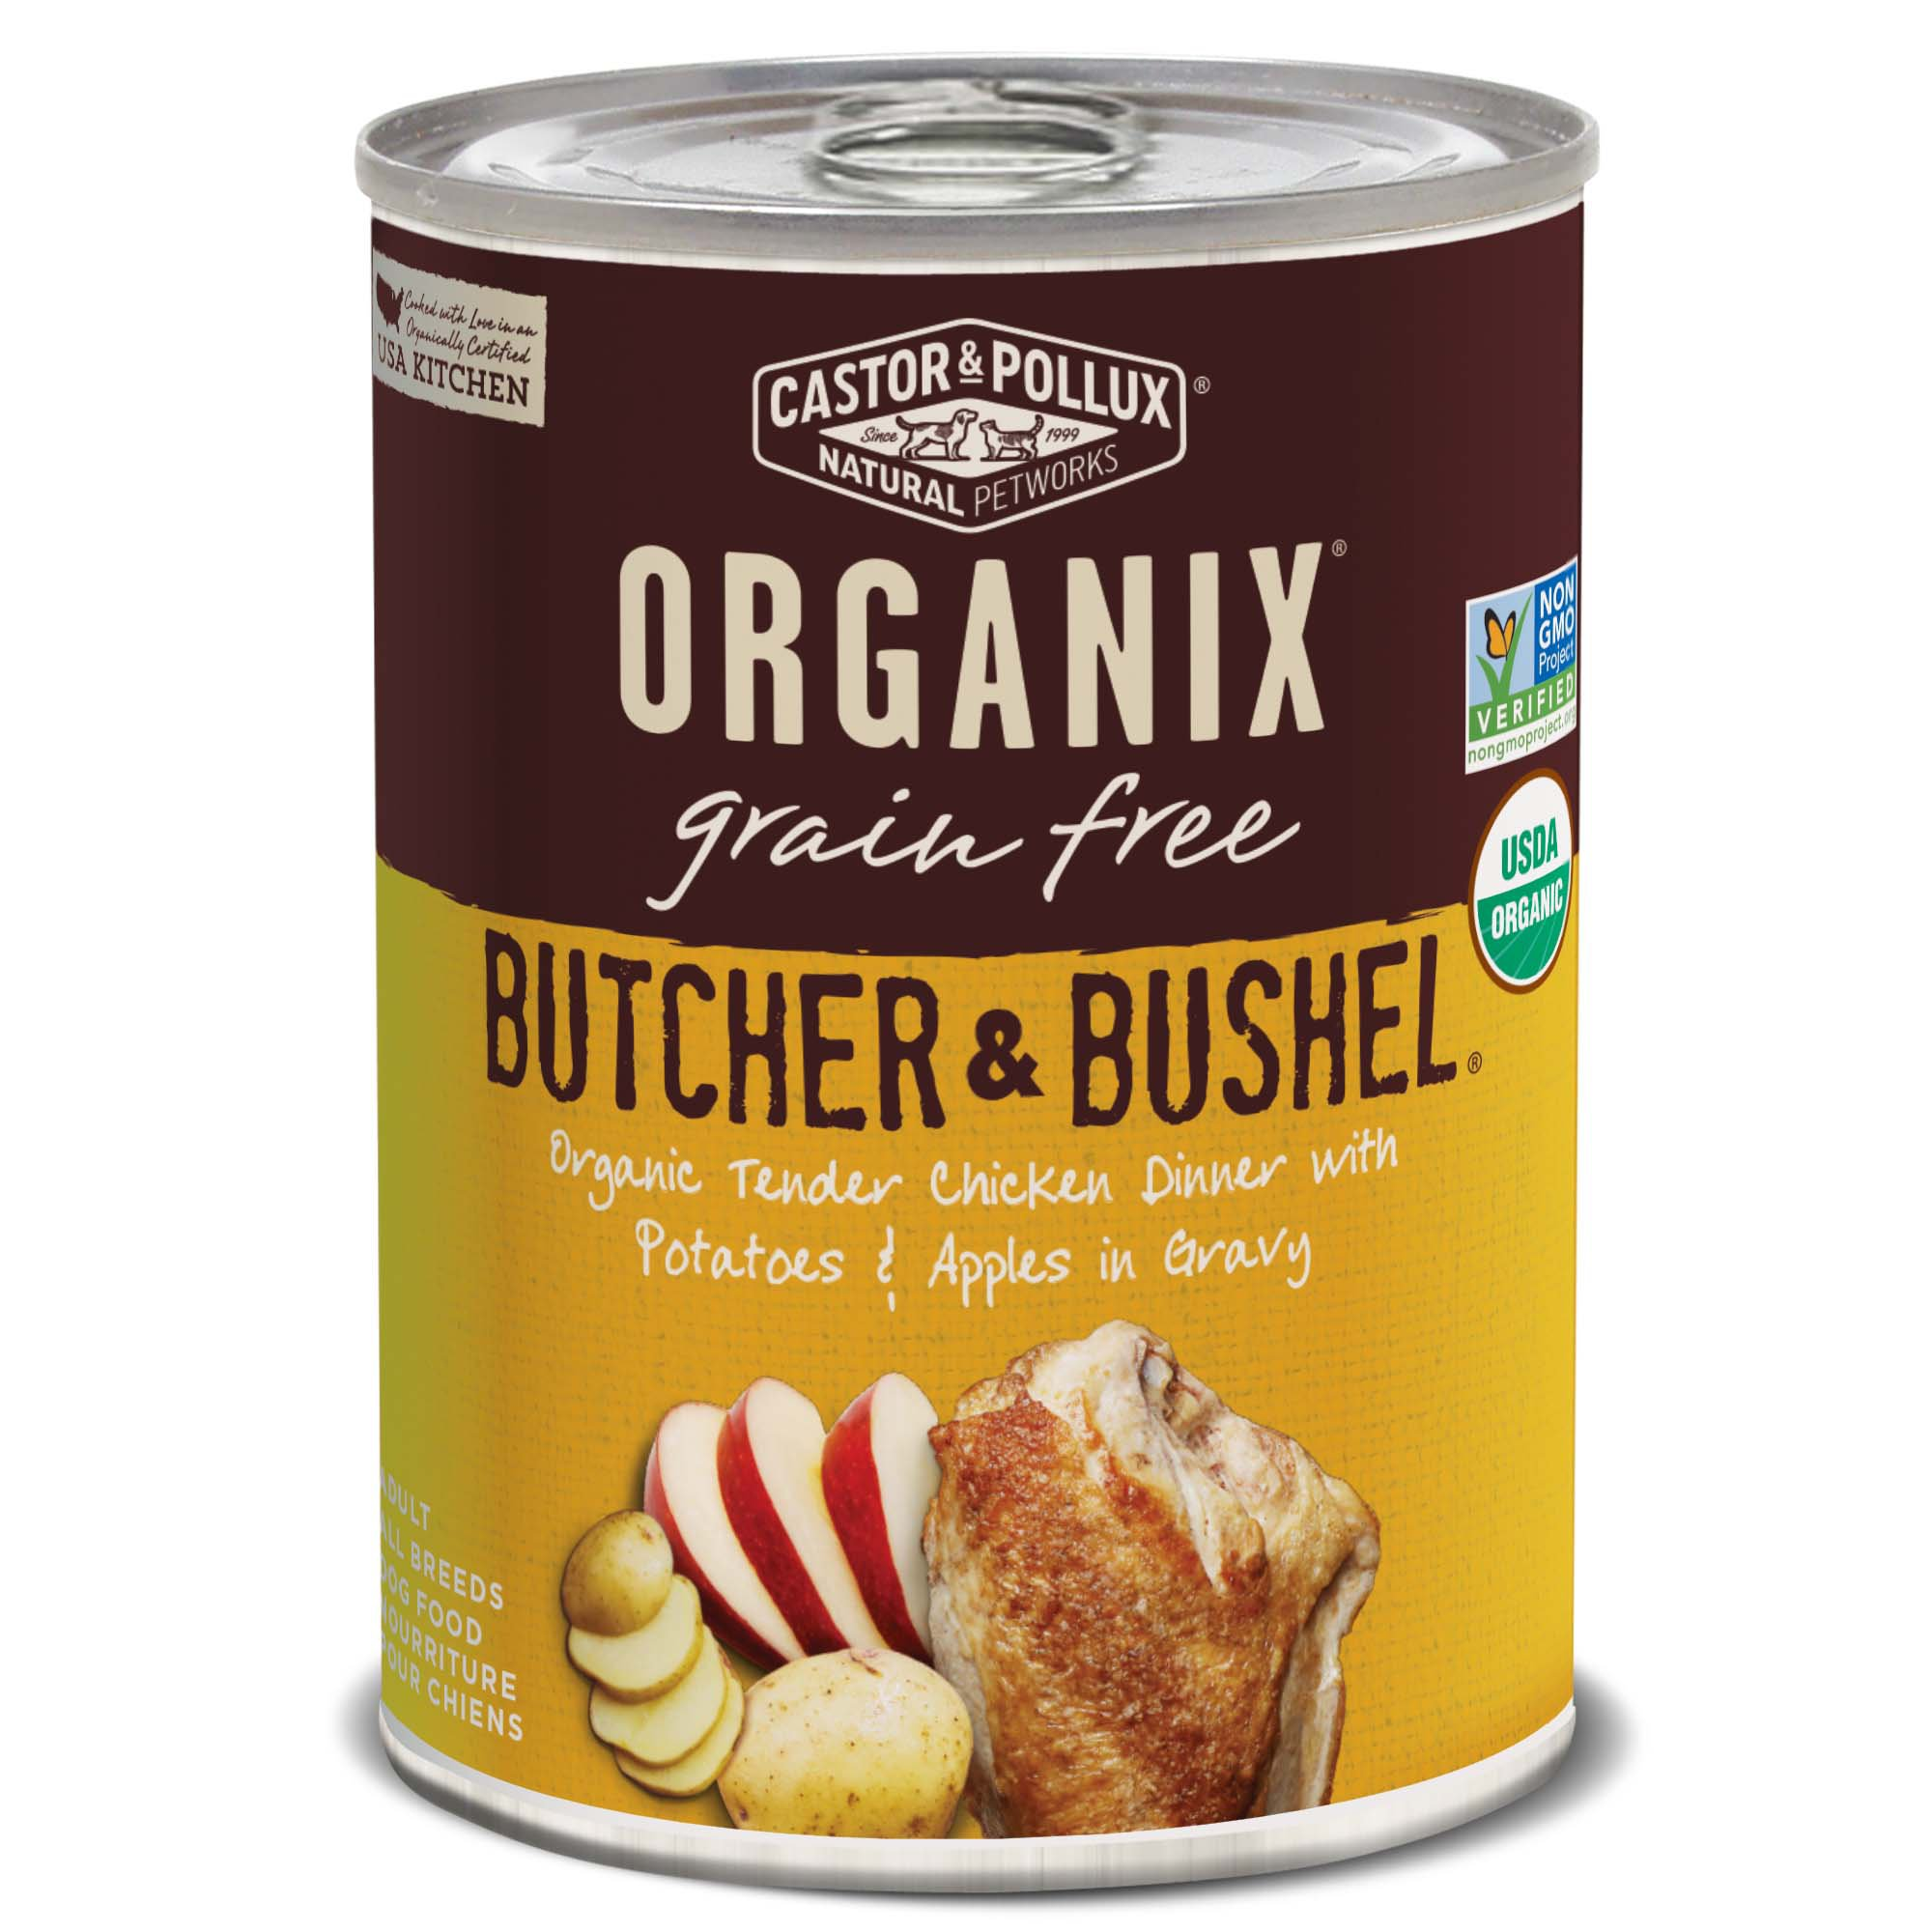 Image of Castor & Pollux Organix Butcher & Bushel Organic Tender Chicken Dinner with Potatoes & Apples Dog Food, 12.7 oz., Case of 12, 12 X 12.7 OZ